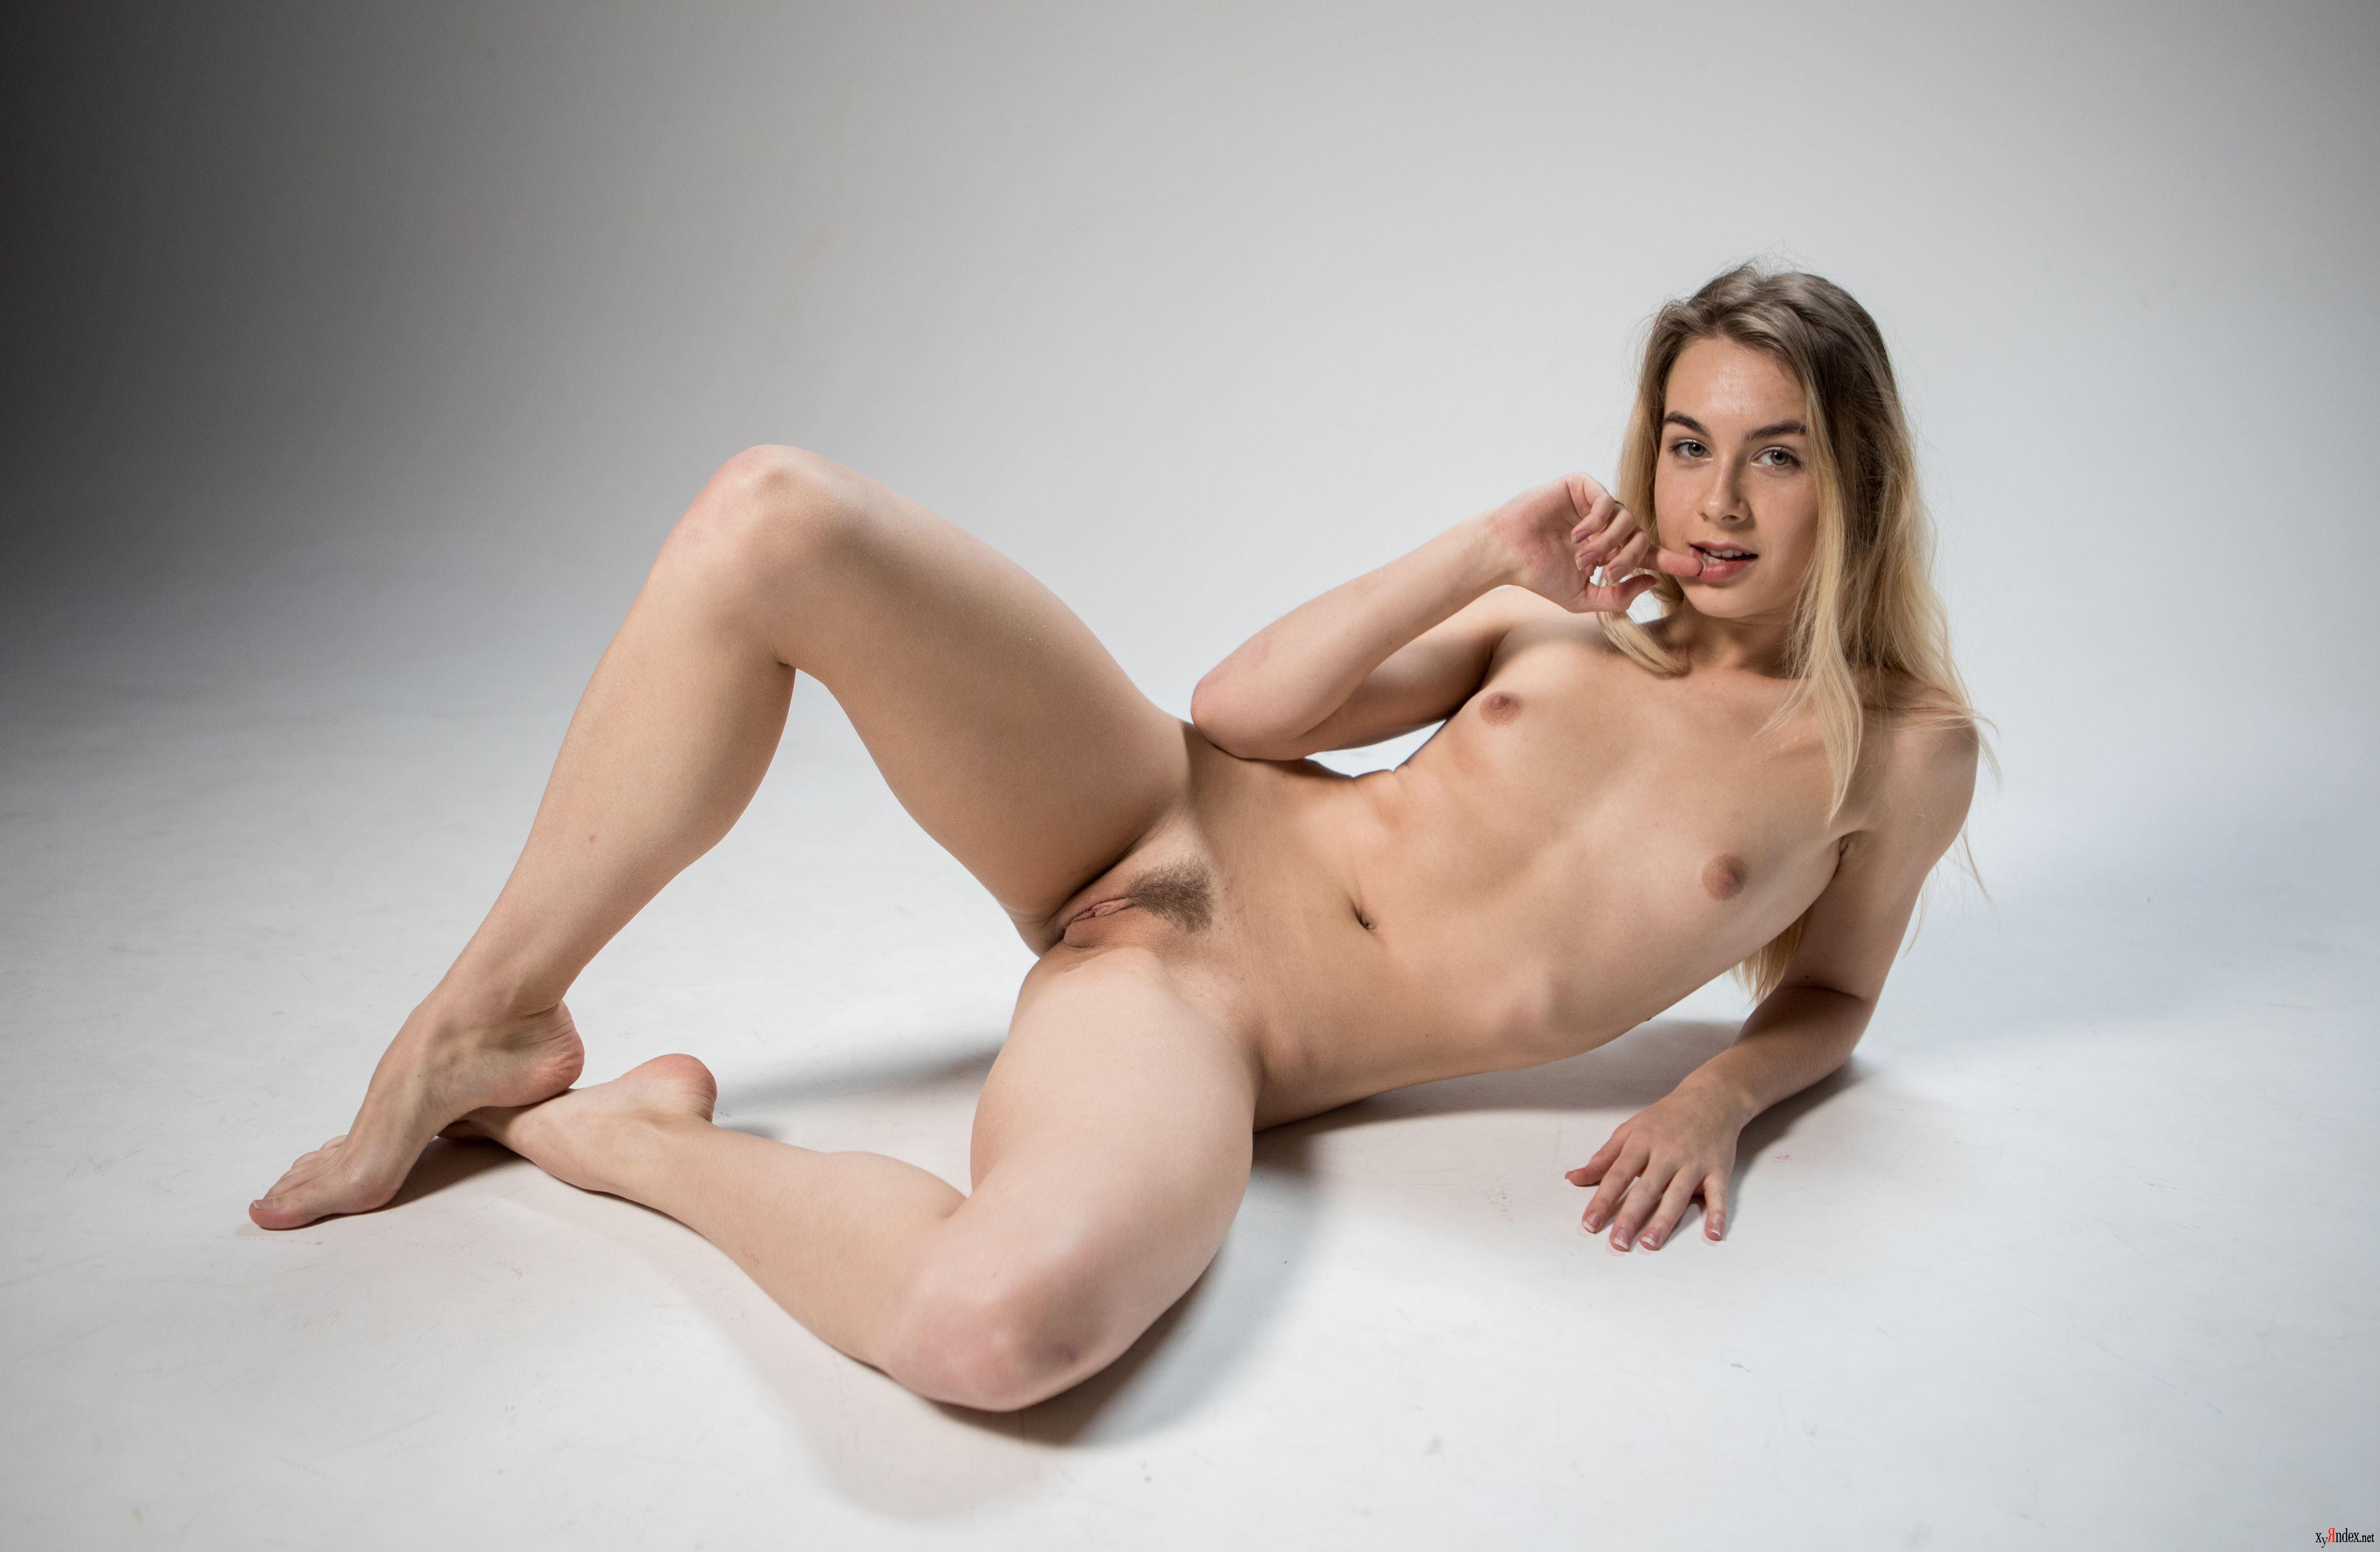 Young little nude alicia fox linares nude sexy